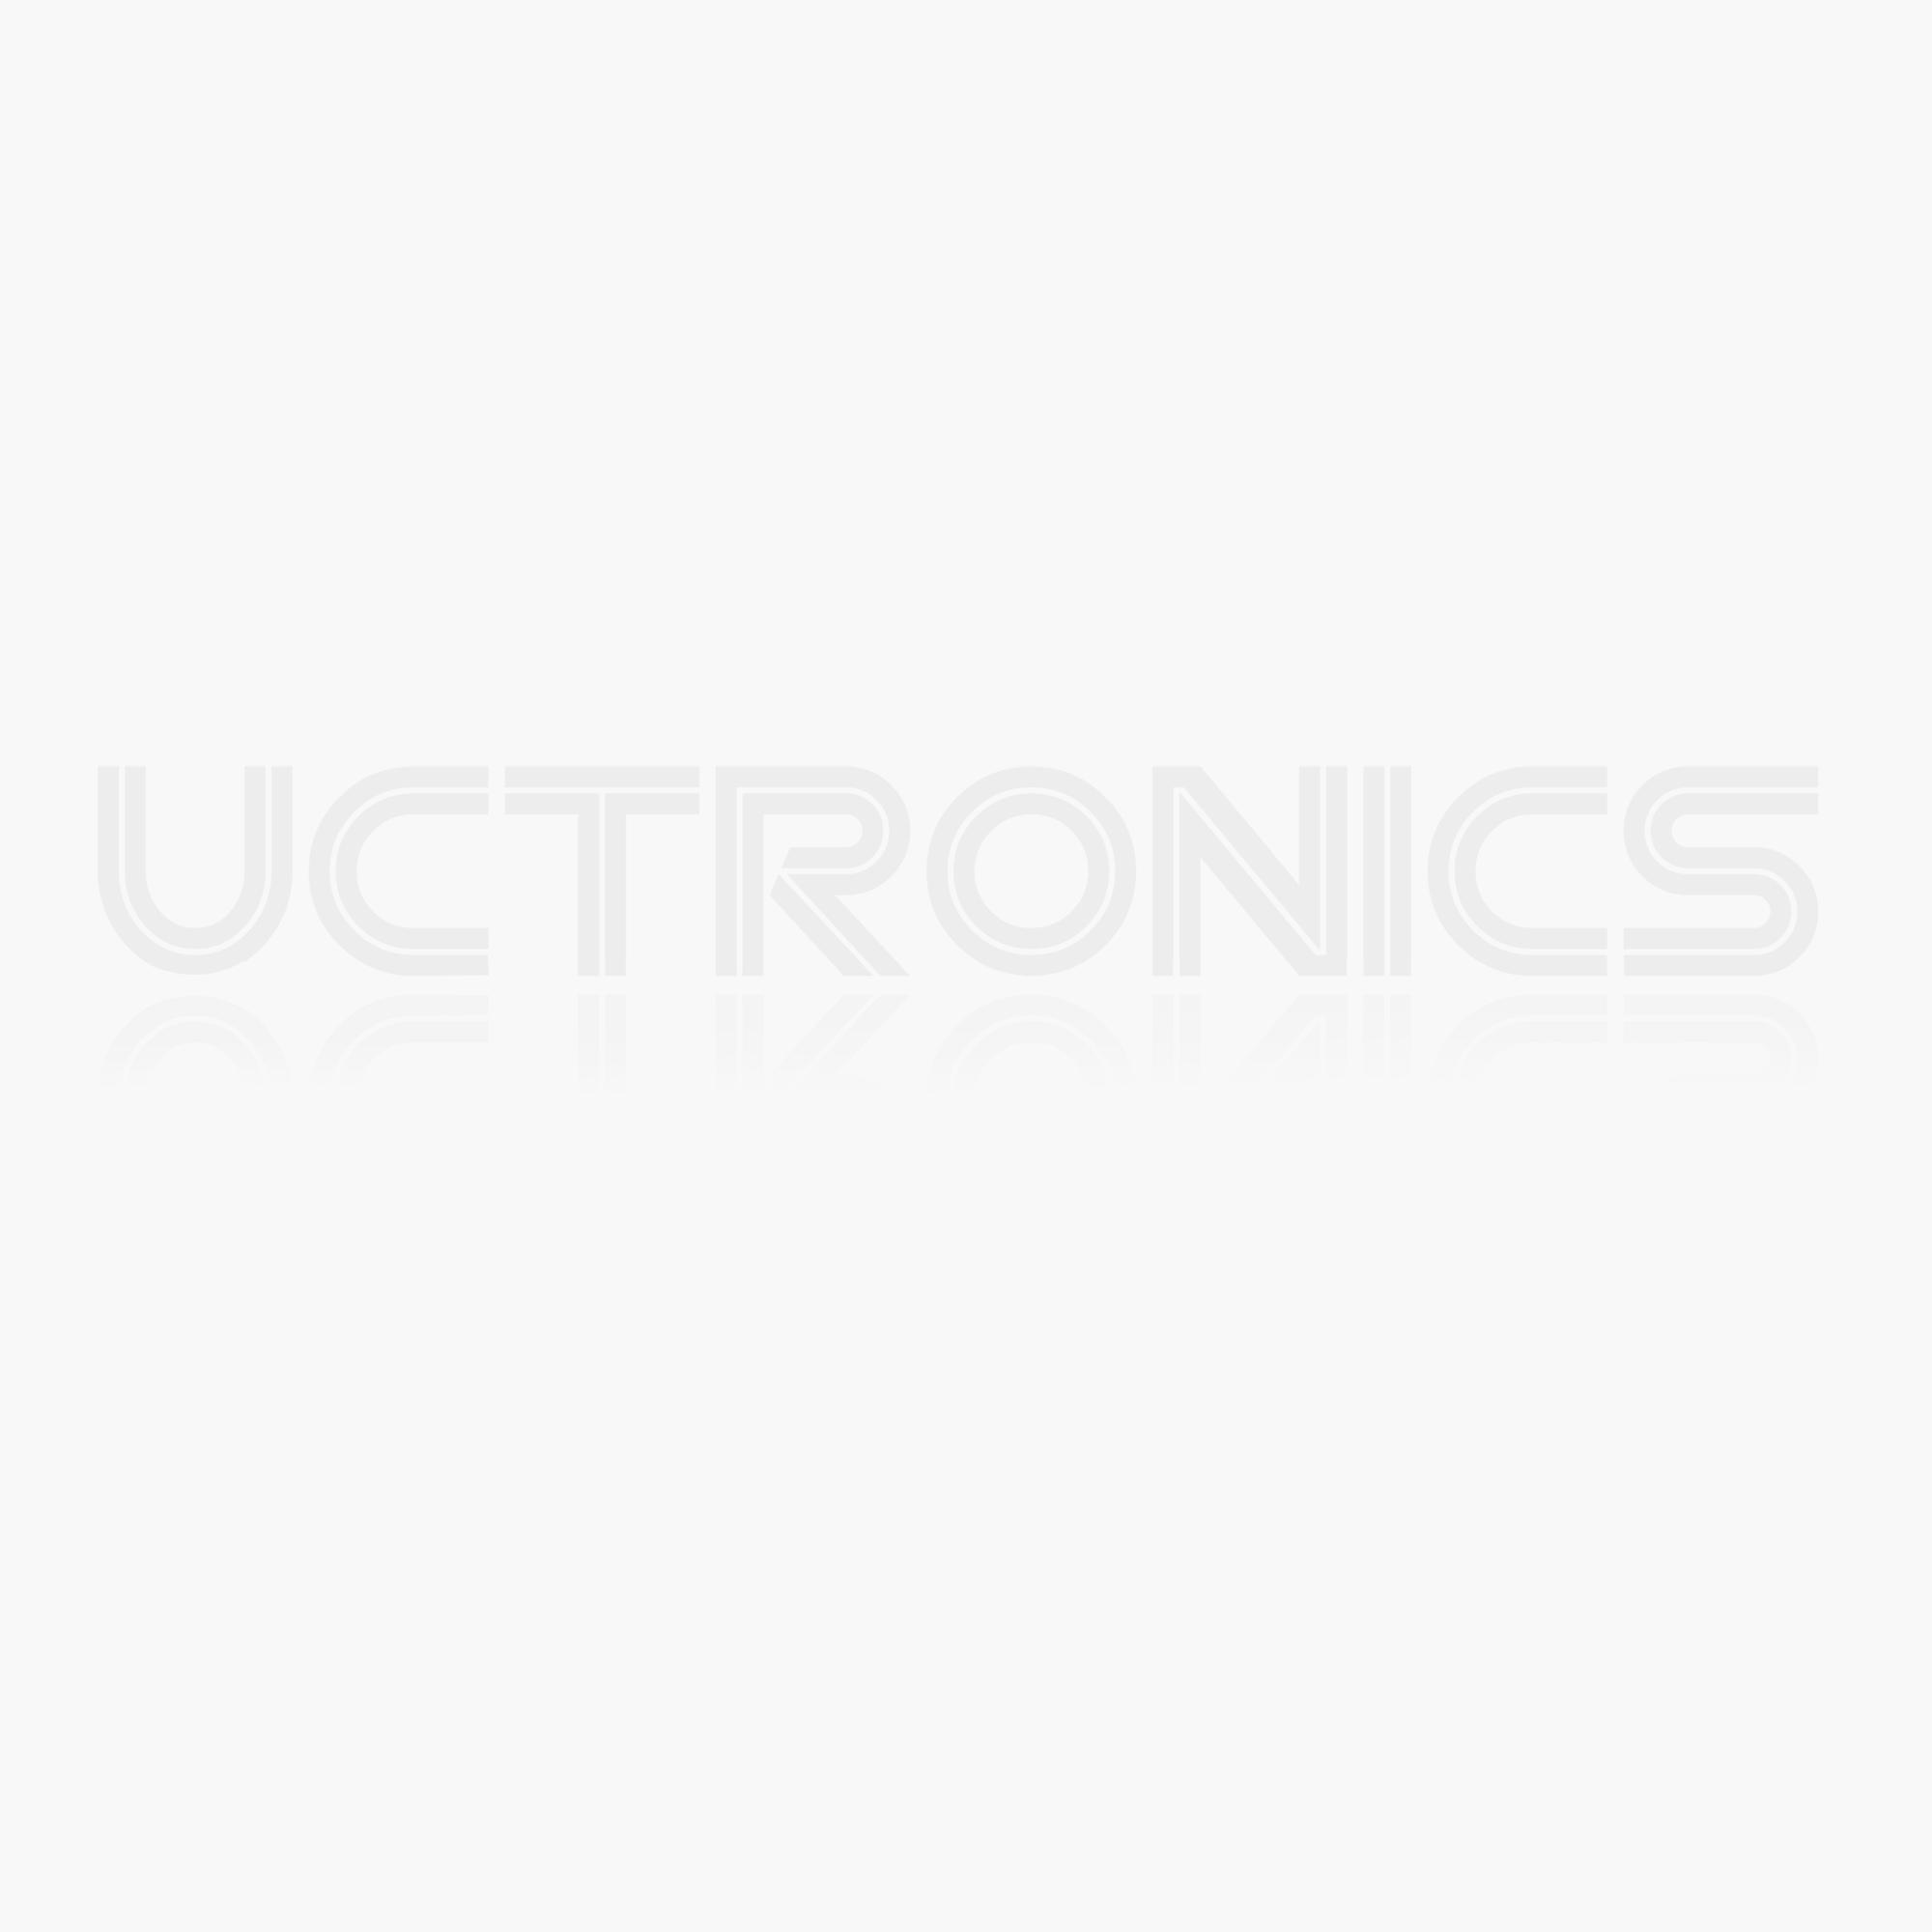 TCST2103 Transmissive Optical Sensor with Phototransistor Output